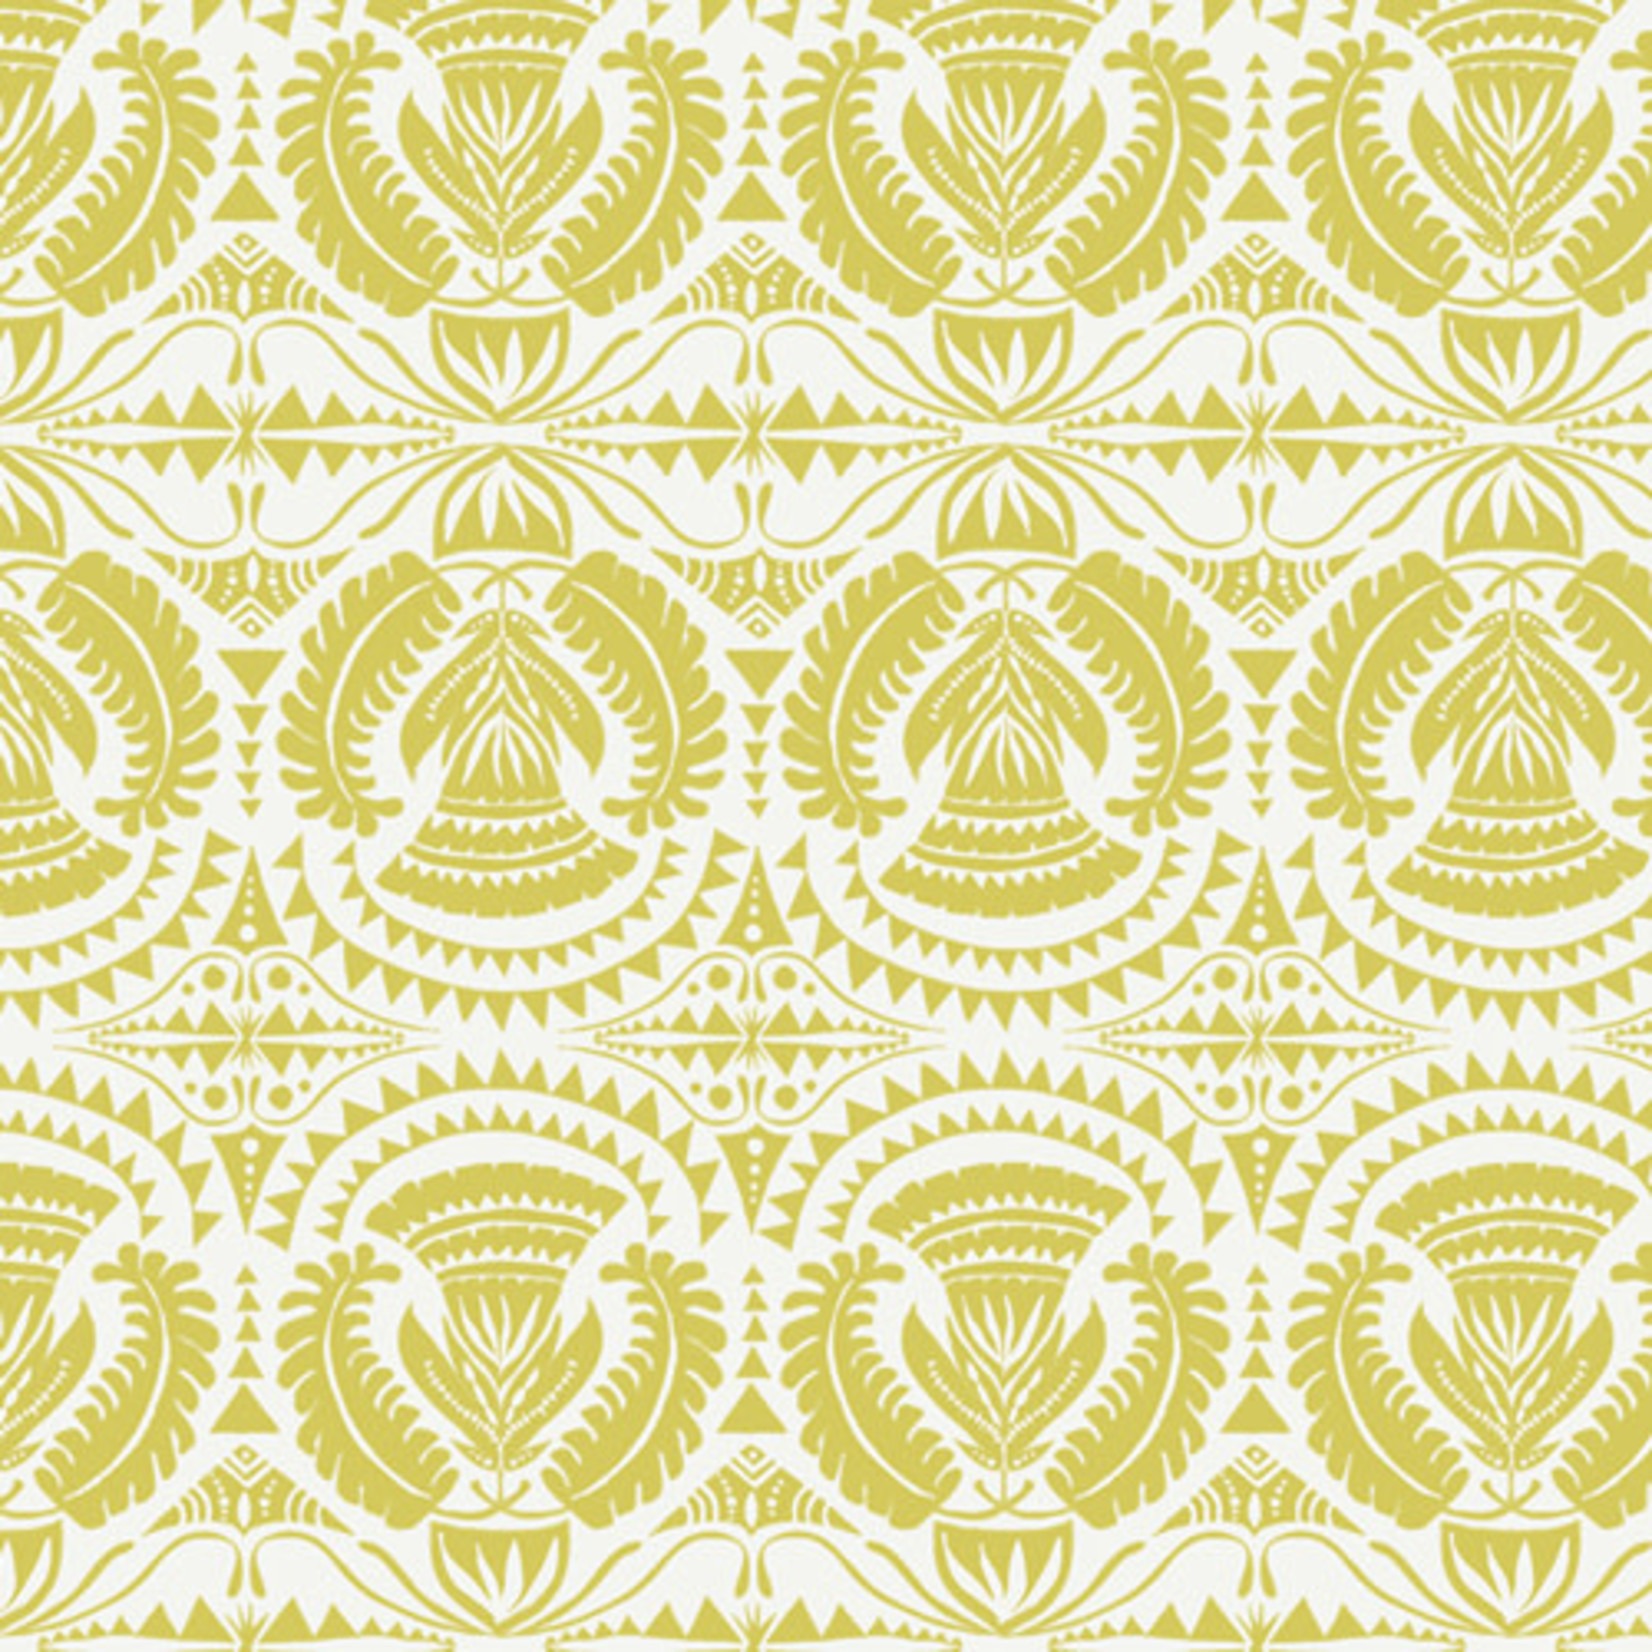 Art Gallery Pollinate, Honeyleaf PLN-94507 $0.20 per cm or $20/m